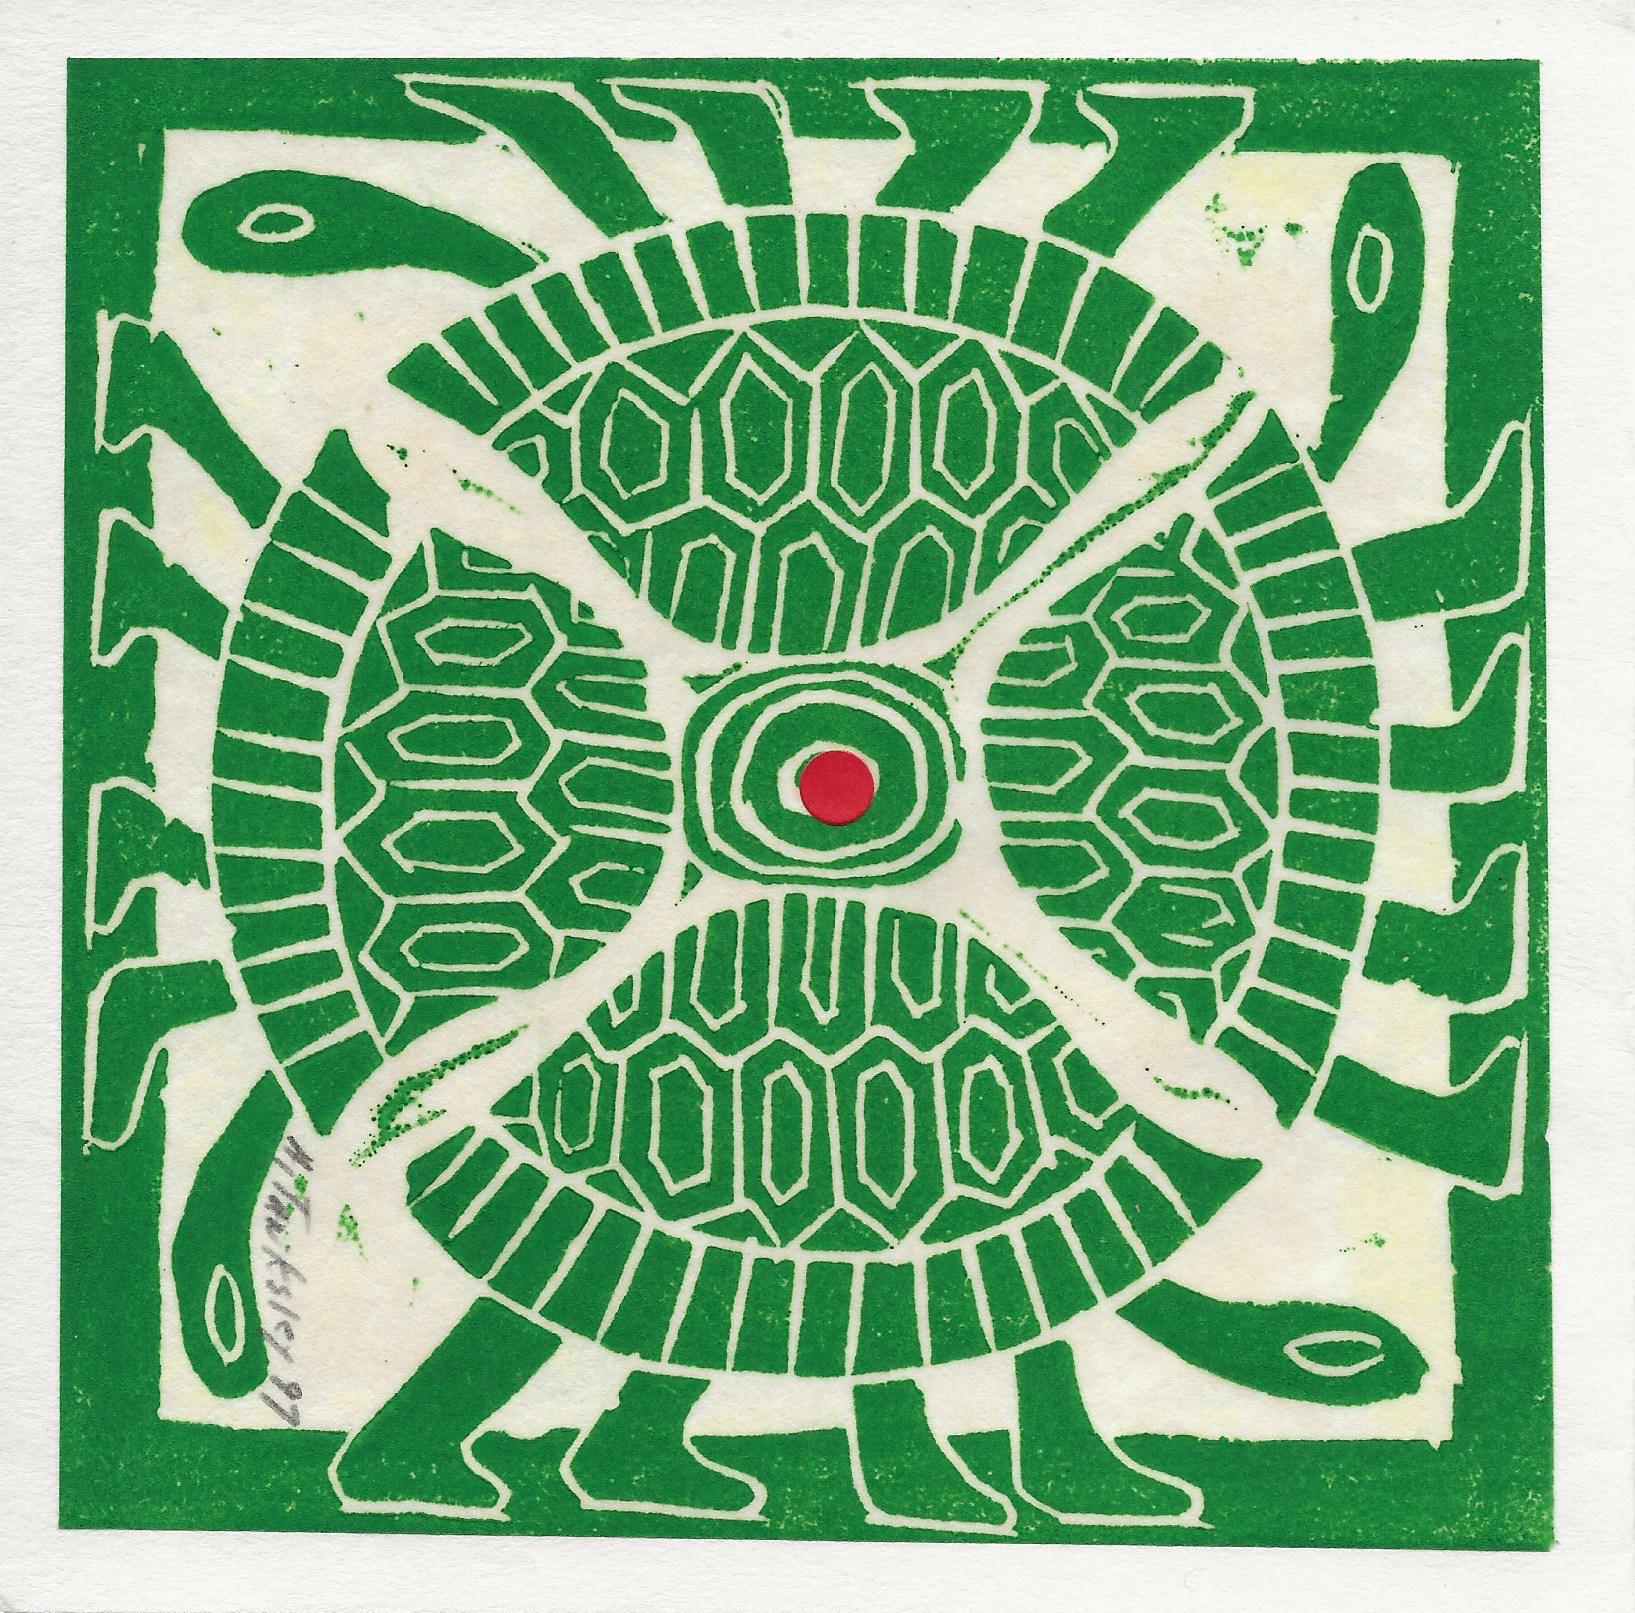 Four green turtles, 1997